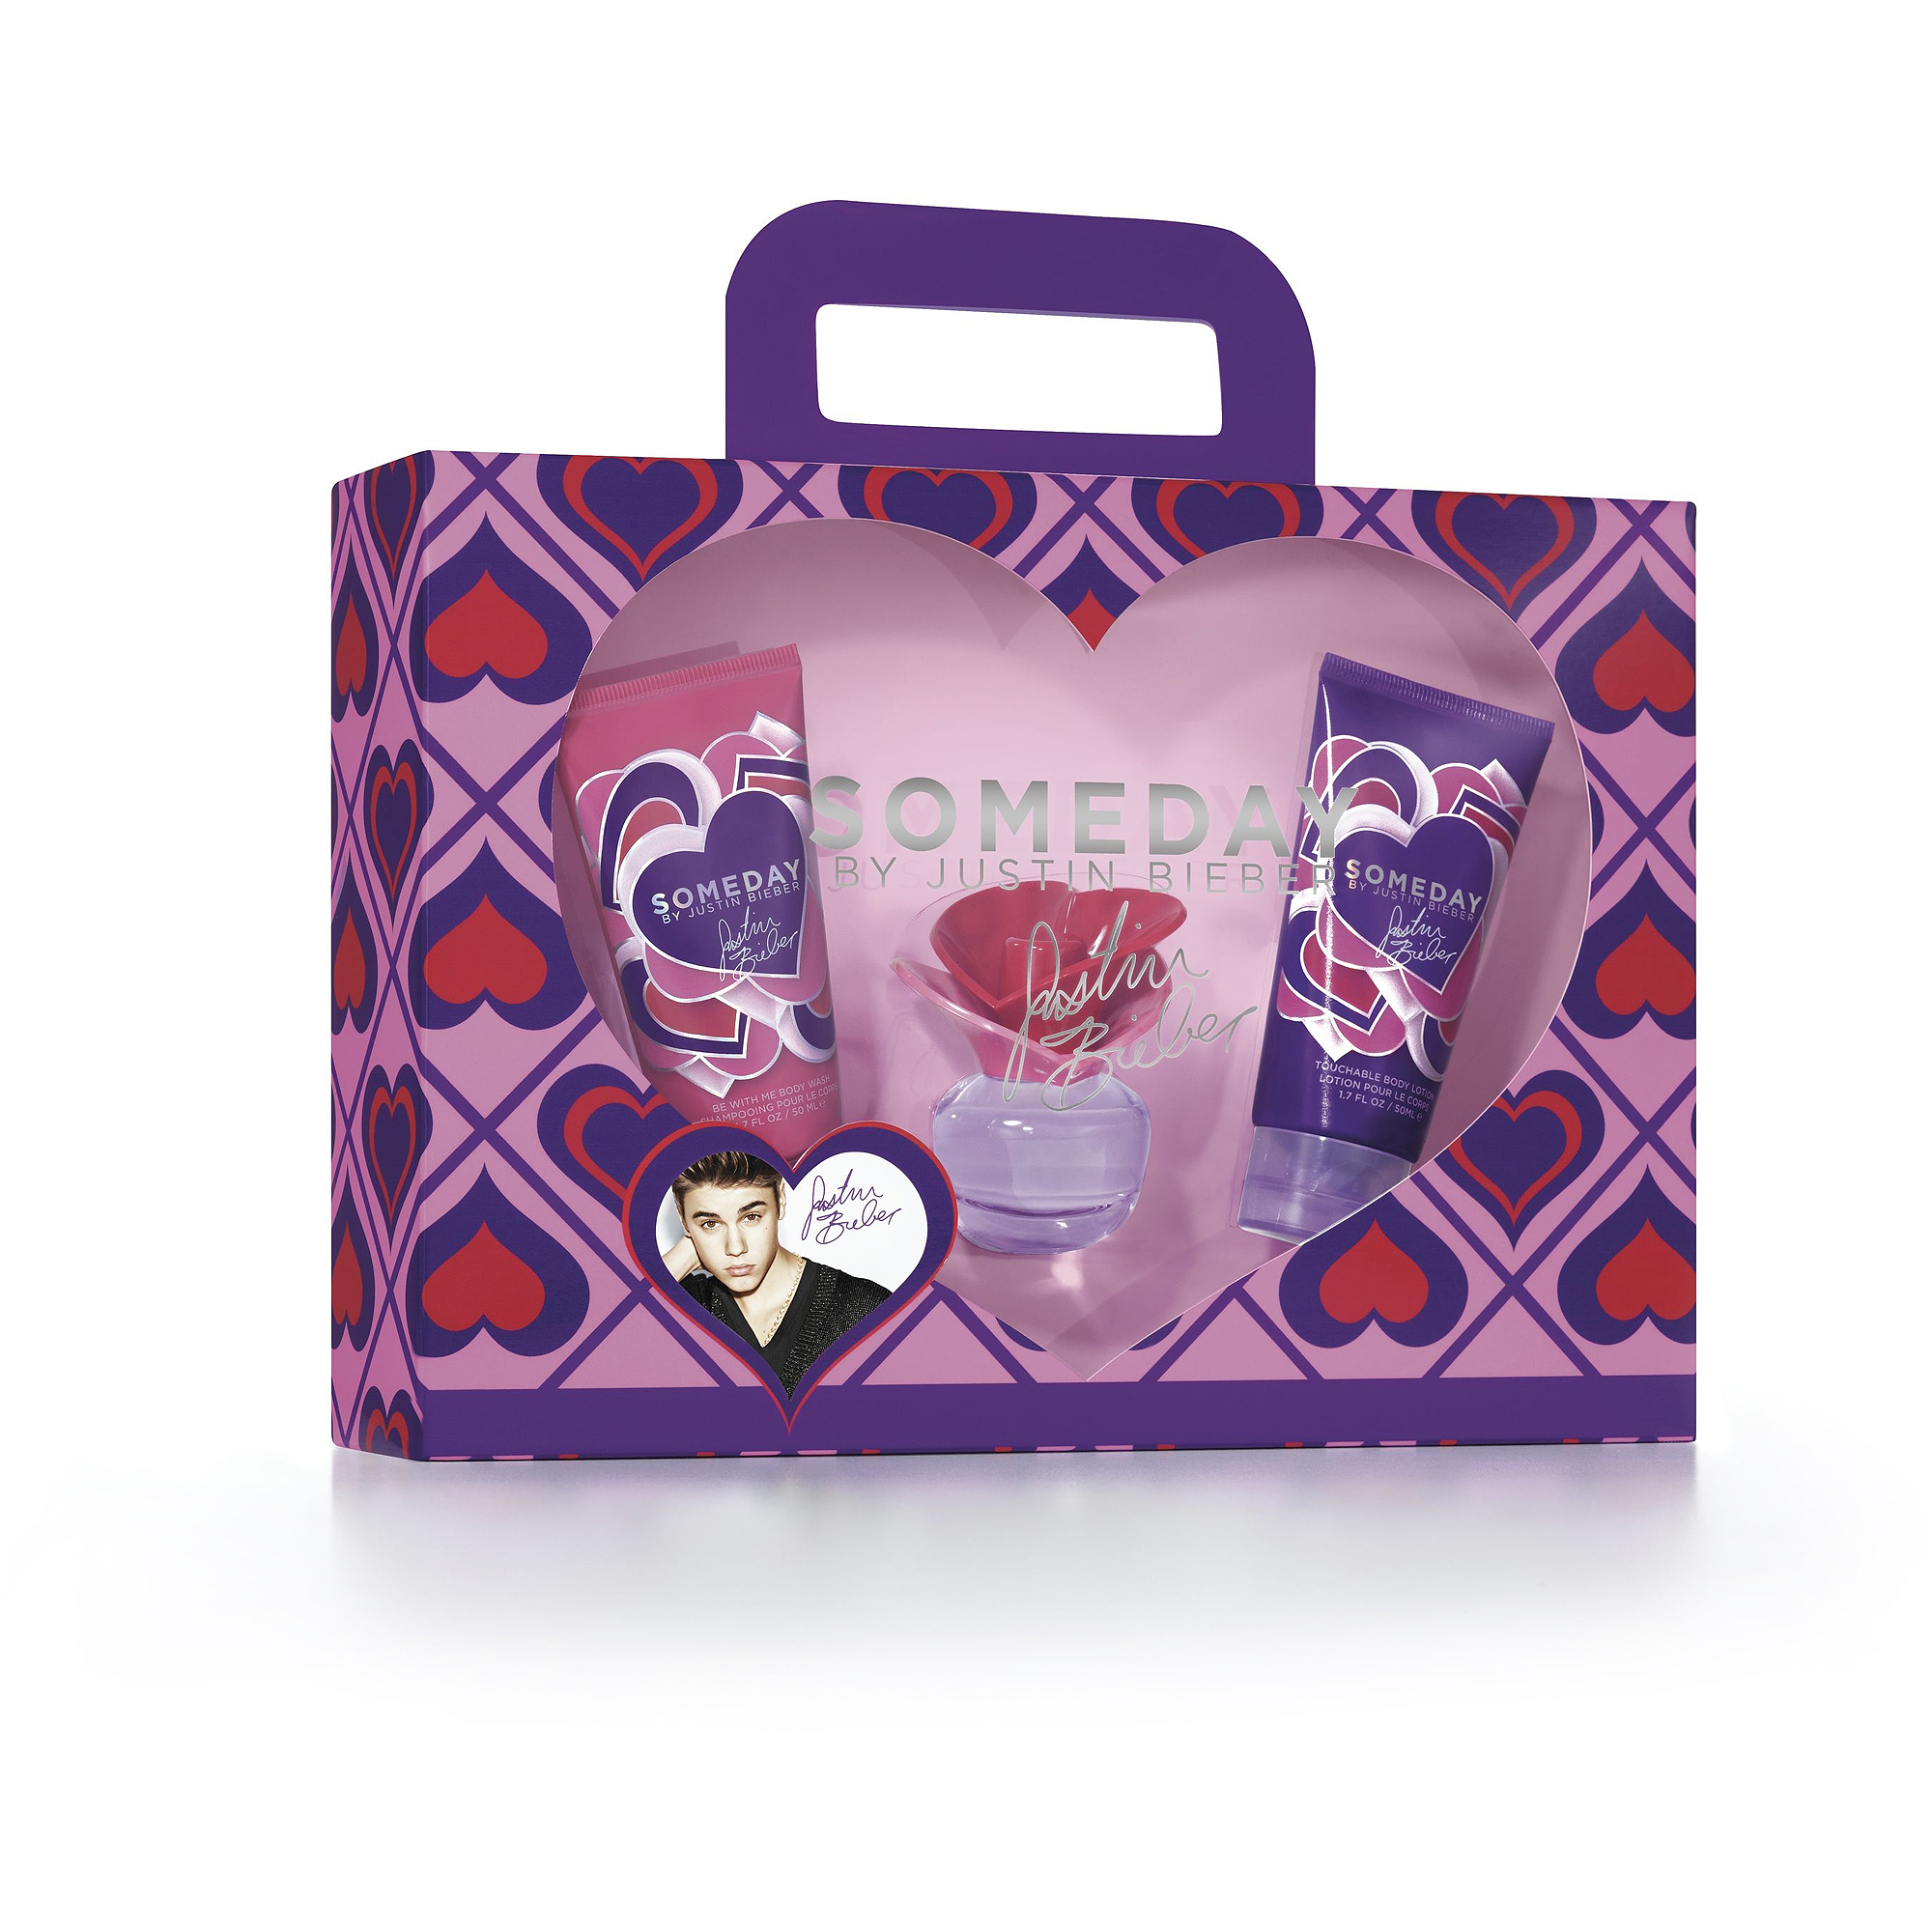 Justin Bieber Someday Gift Set for Women, 3 pc - Walmart.com